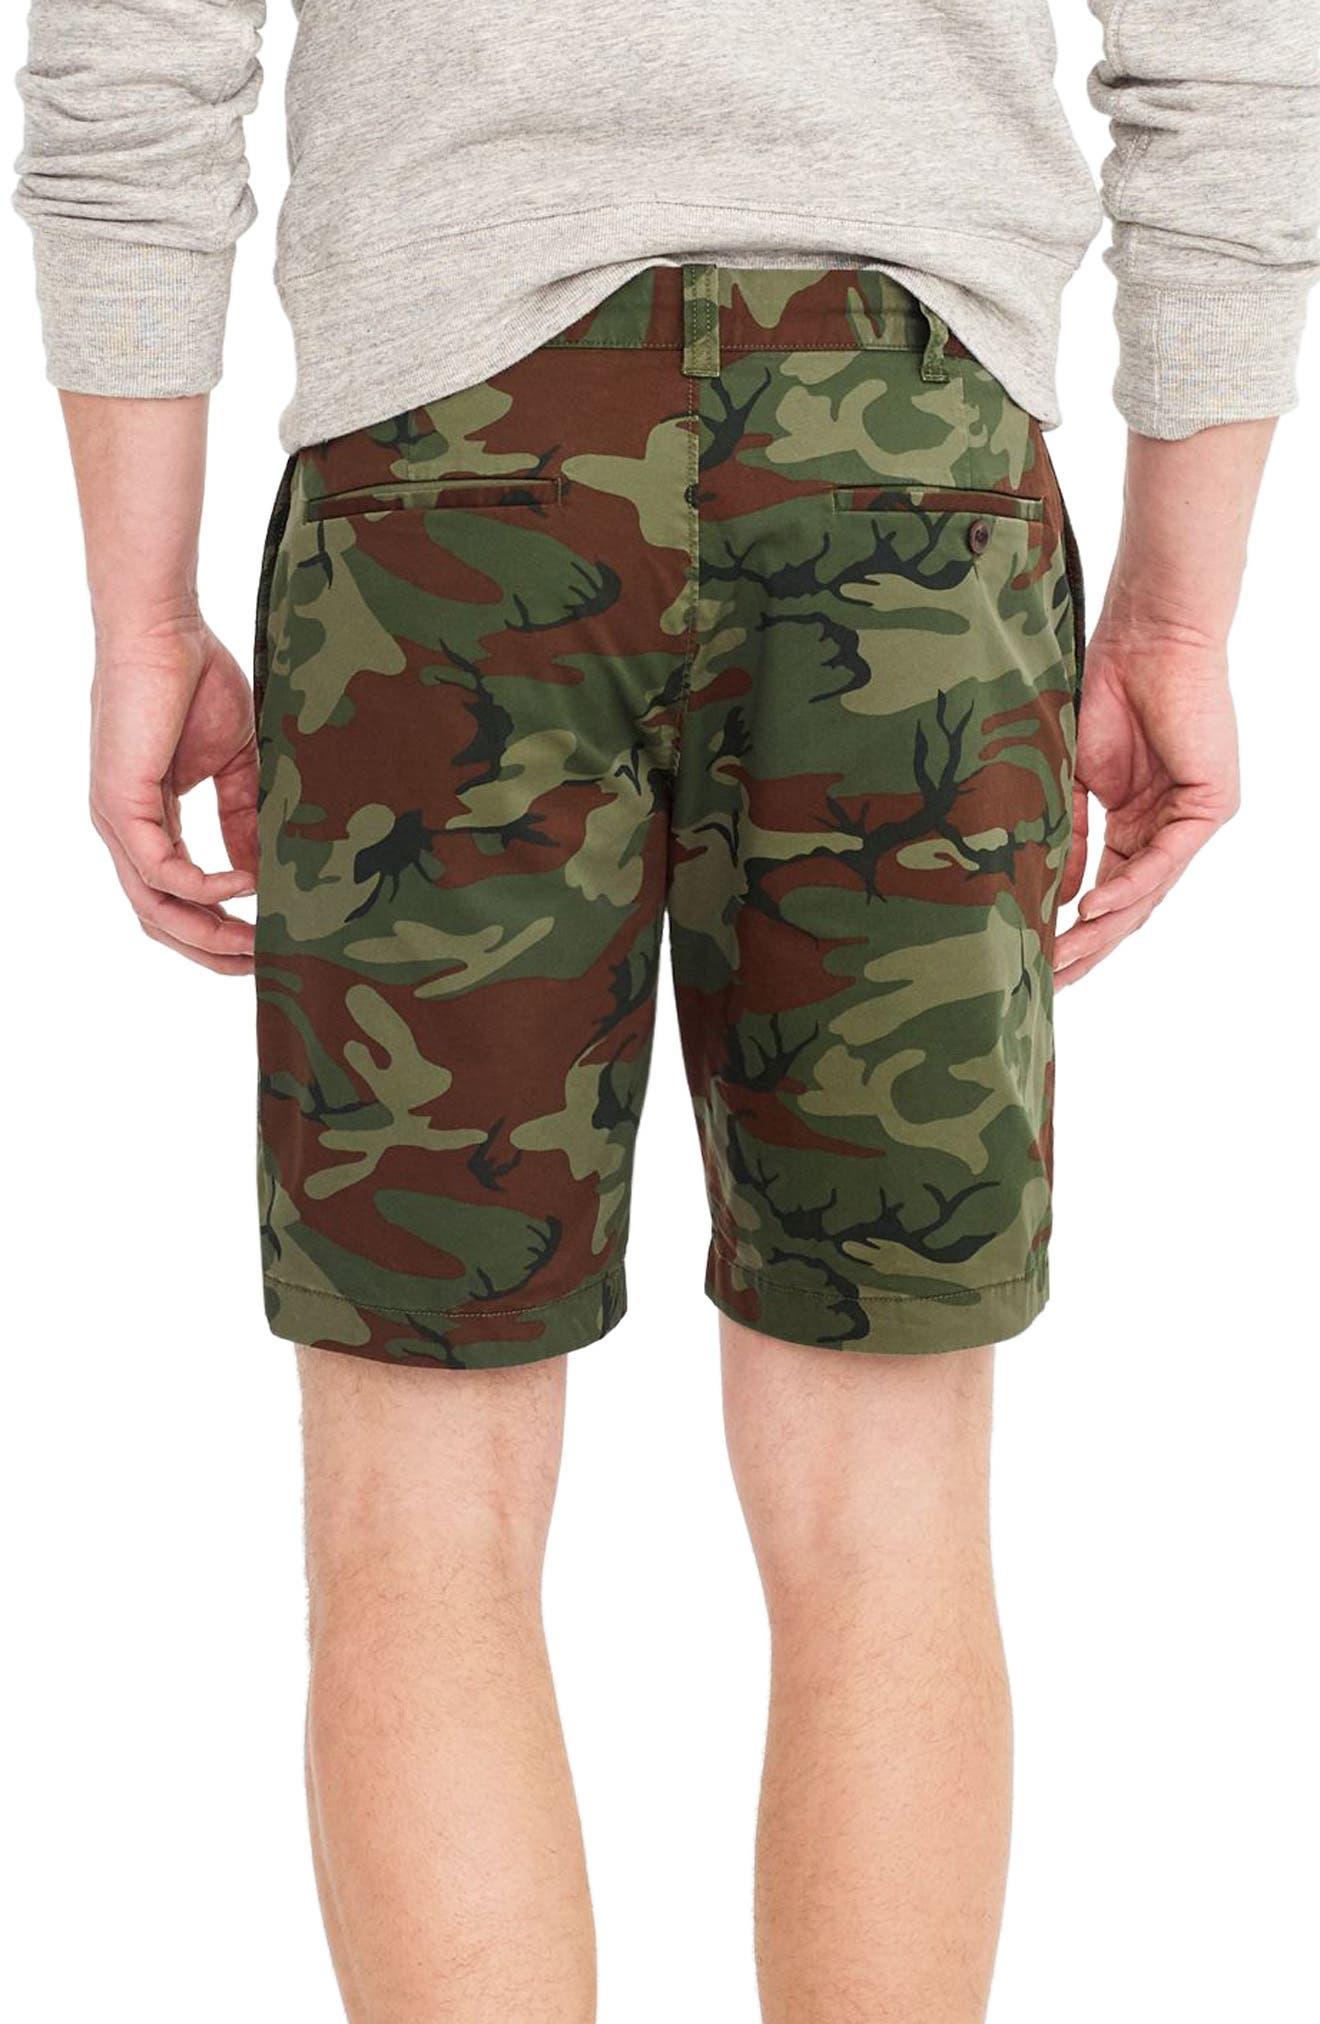 J.Crew Stretch Camo Shorts,                             Alternate thumbnail 2, color,                             Camo Wamo